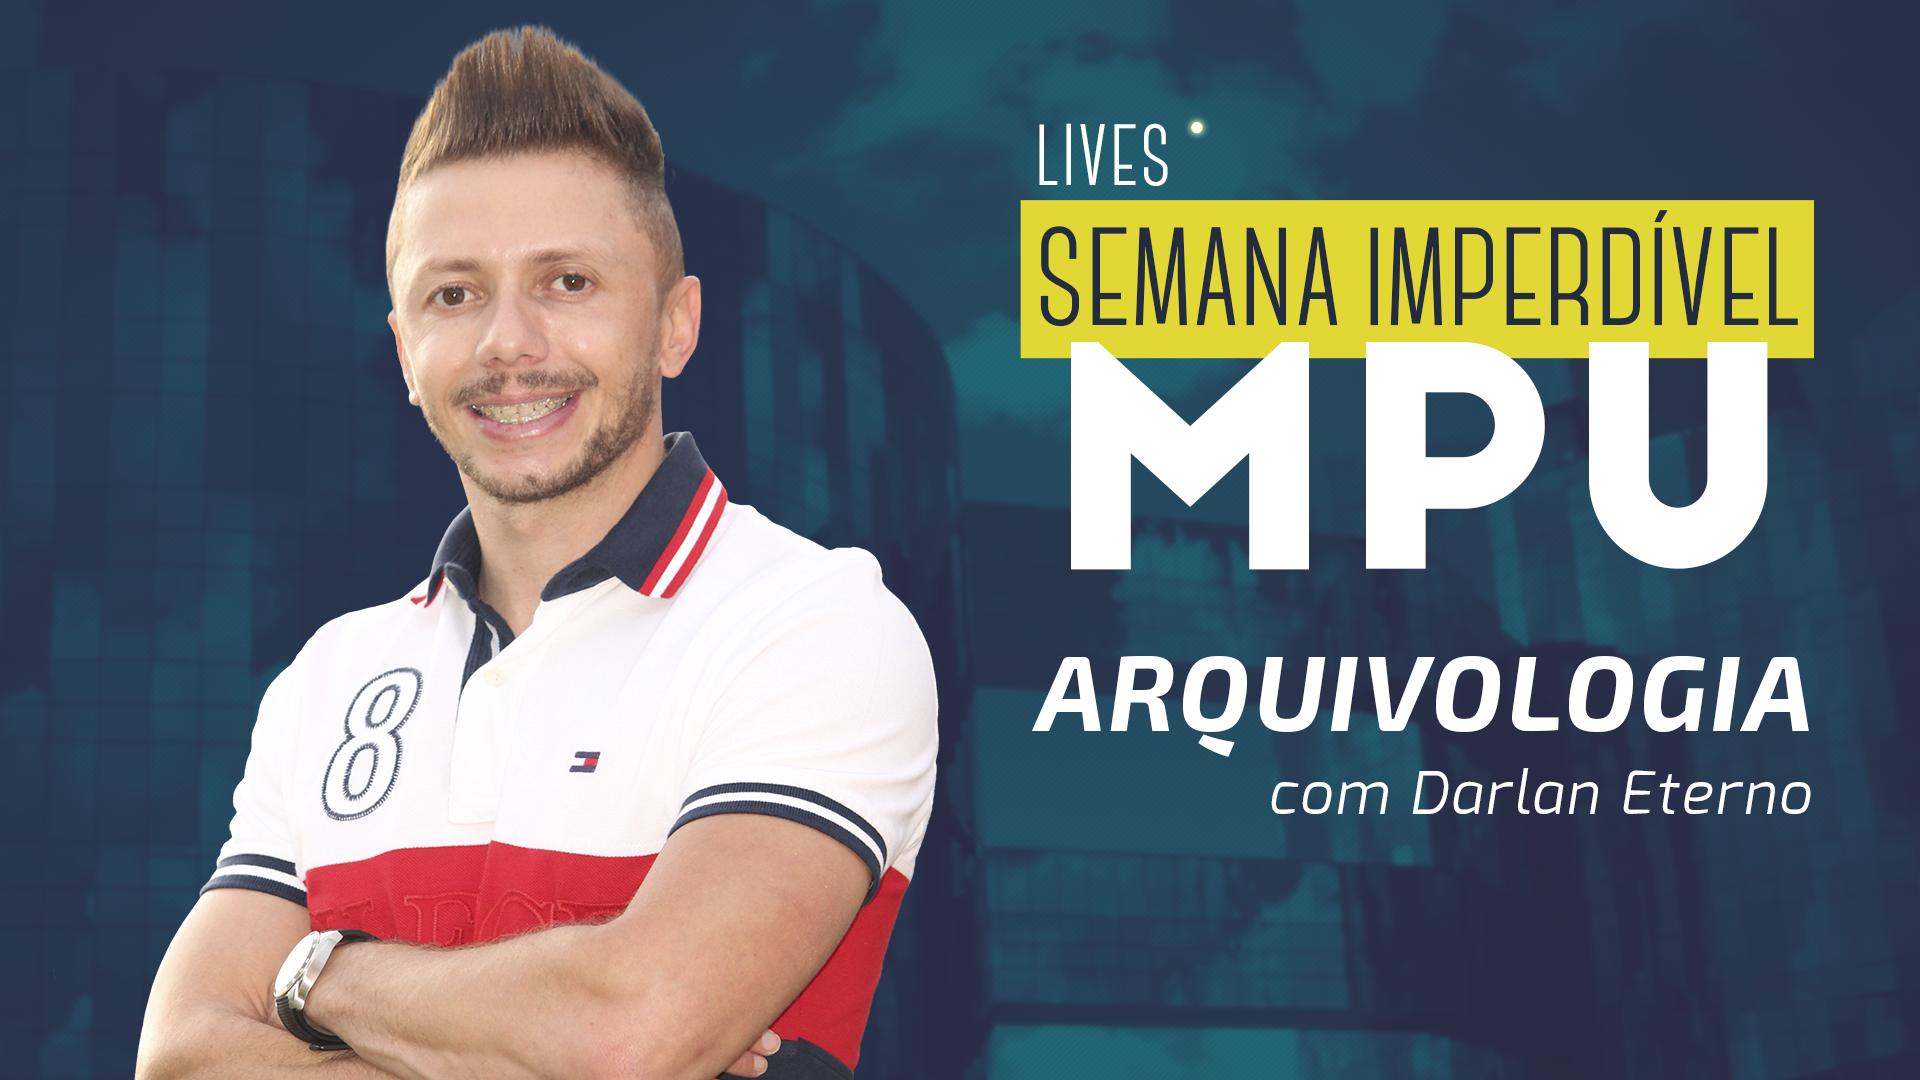 Semana Imperdível MPU - Arquivologia | Prof.Darlan Eterno